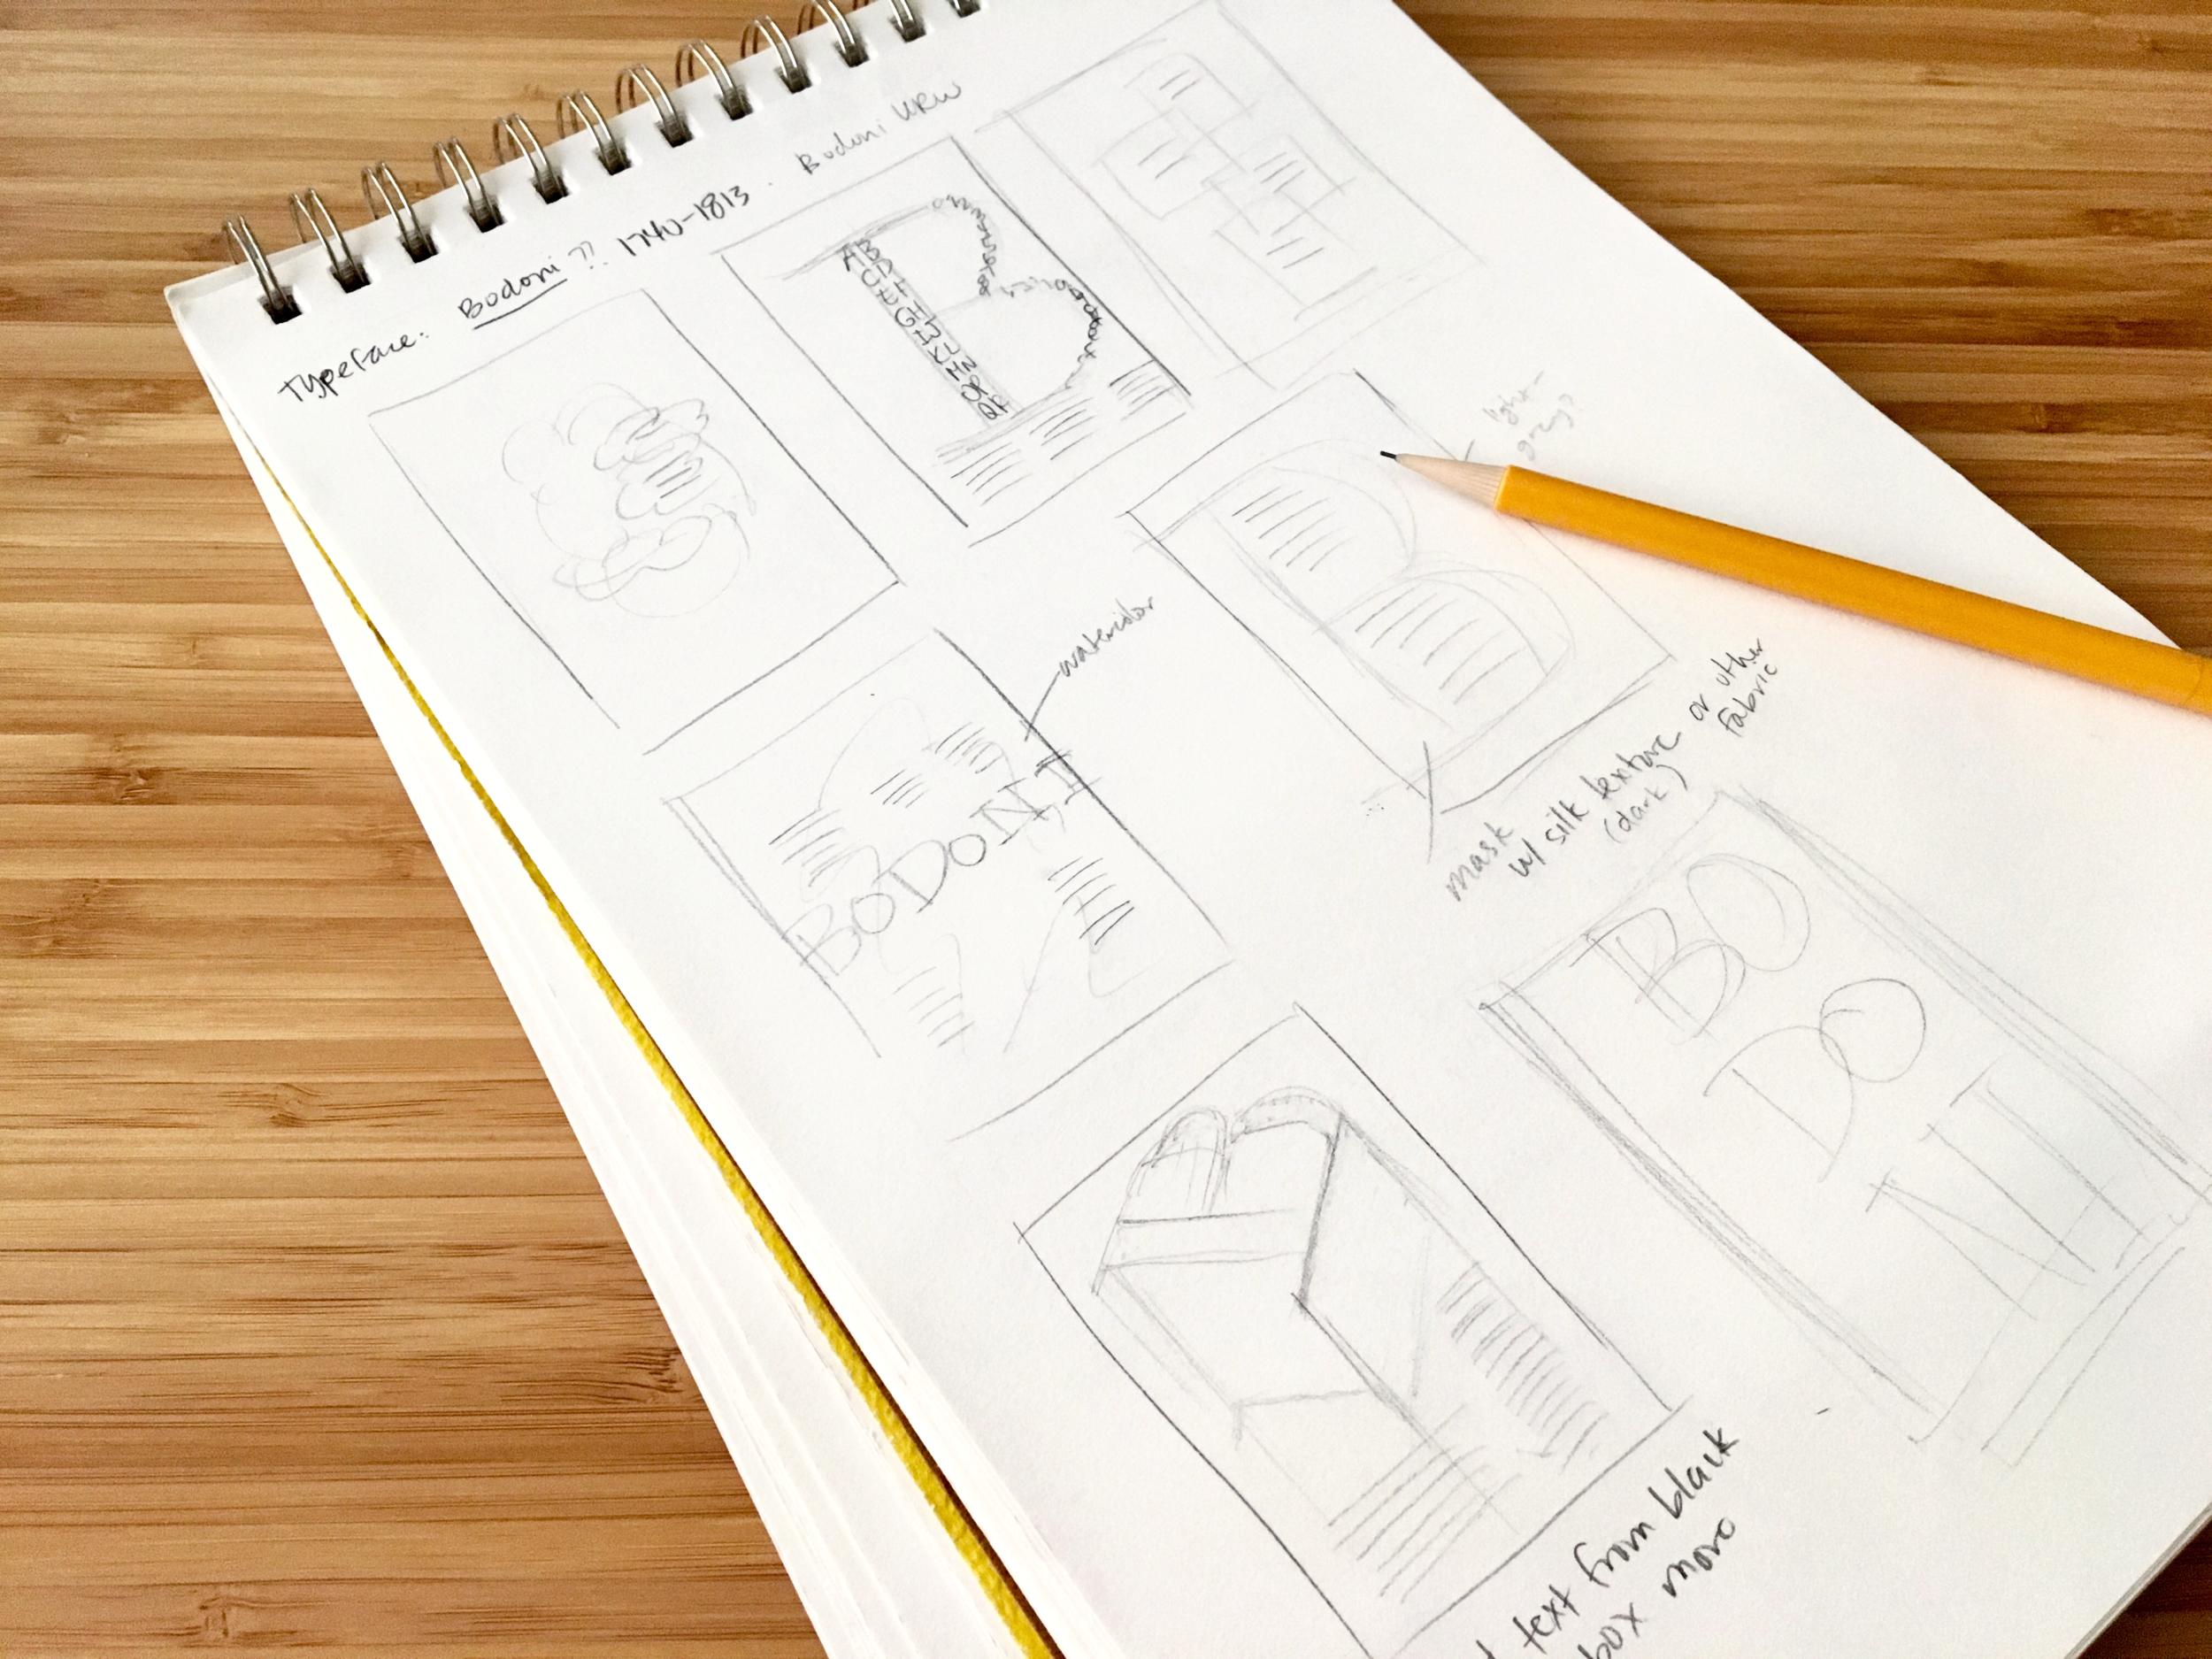 Brainstorm sketches.